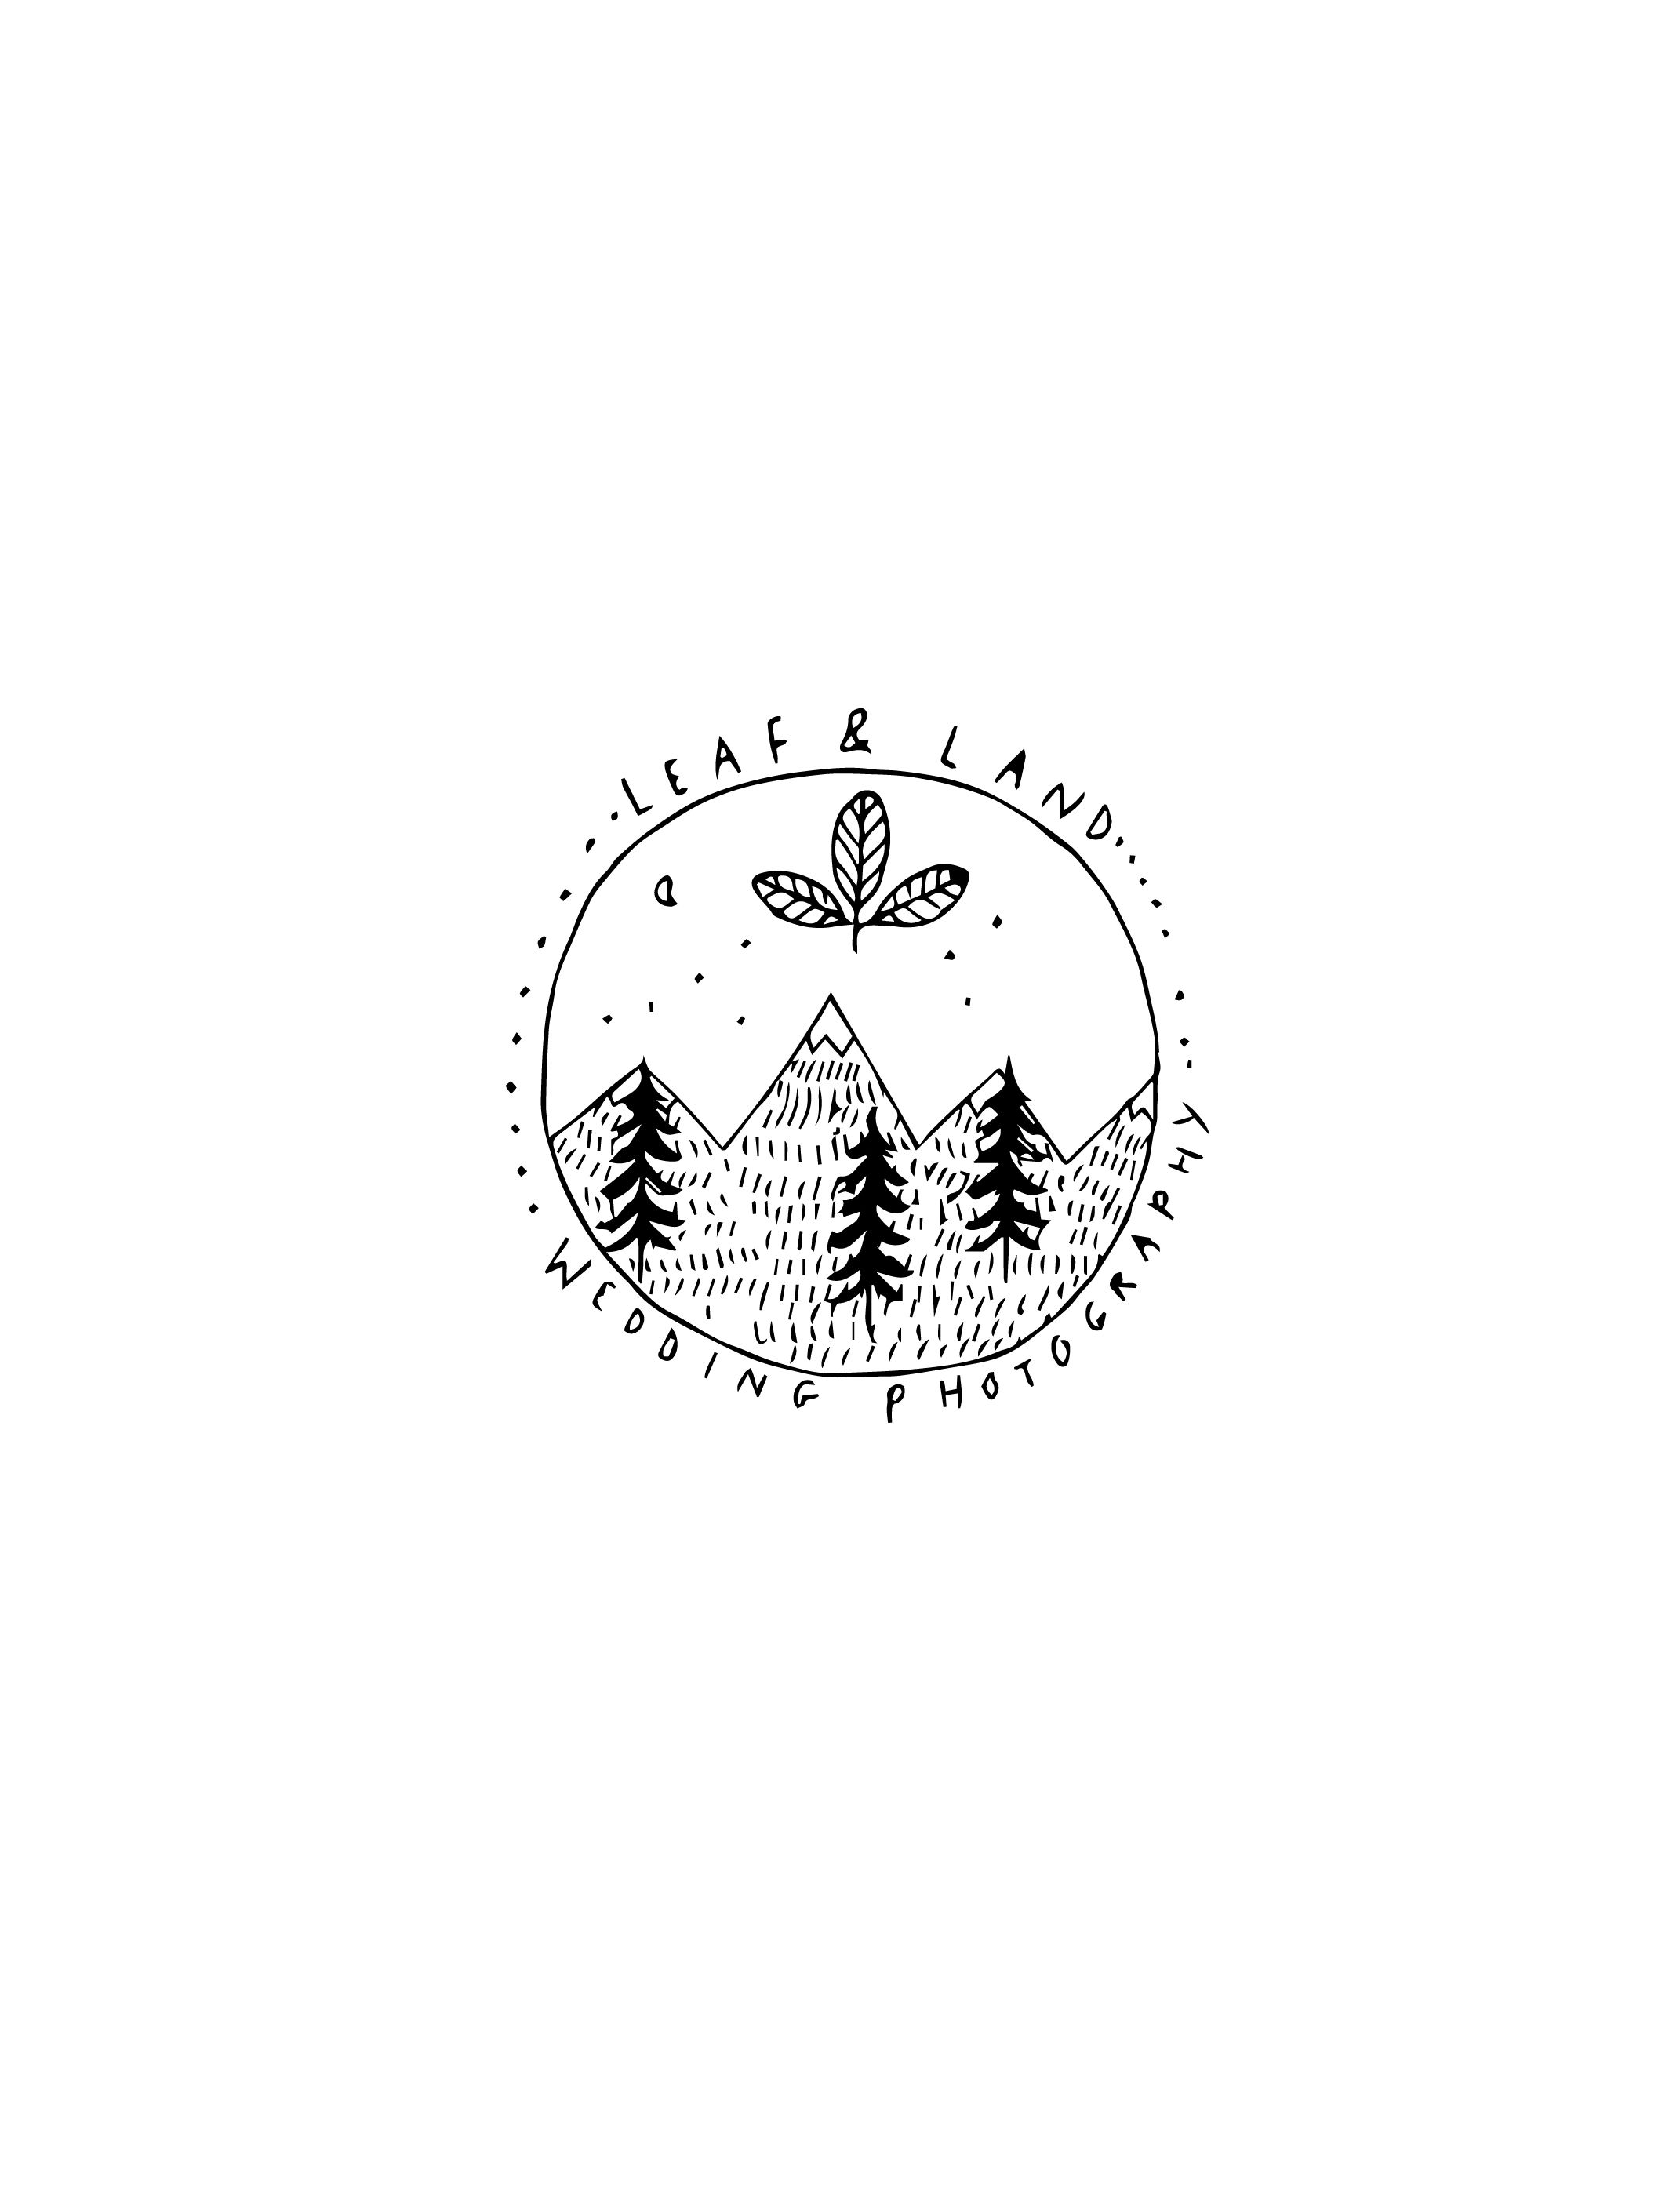 Logo design by Ryn Frank www.rynfrankdesign.co.uk Hand